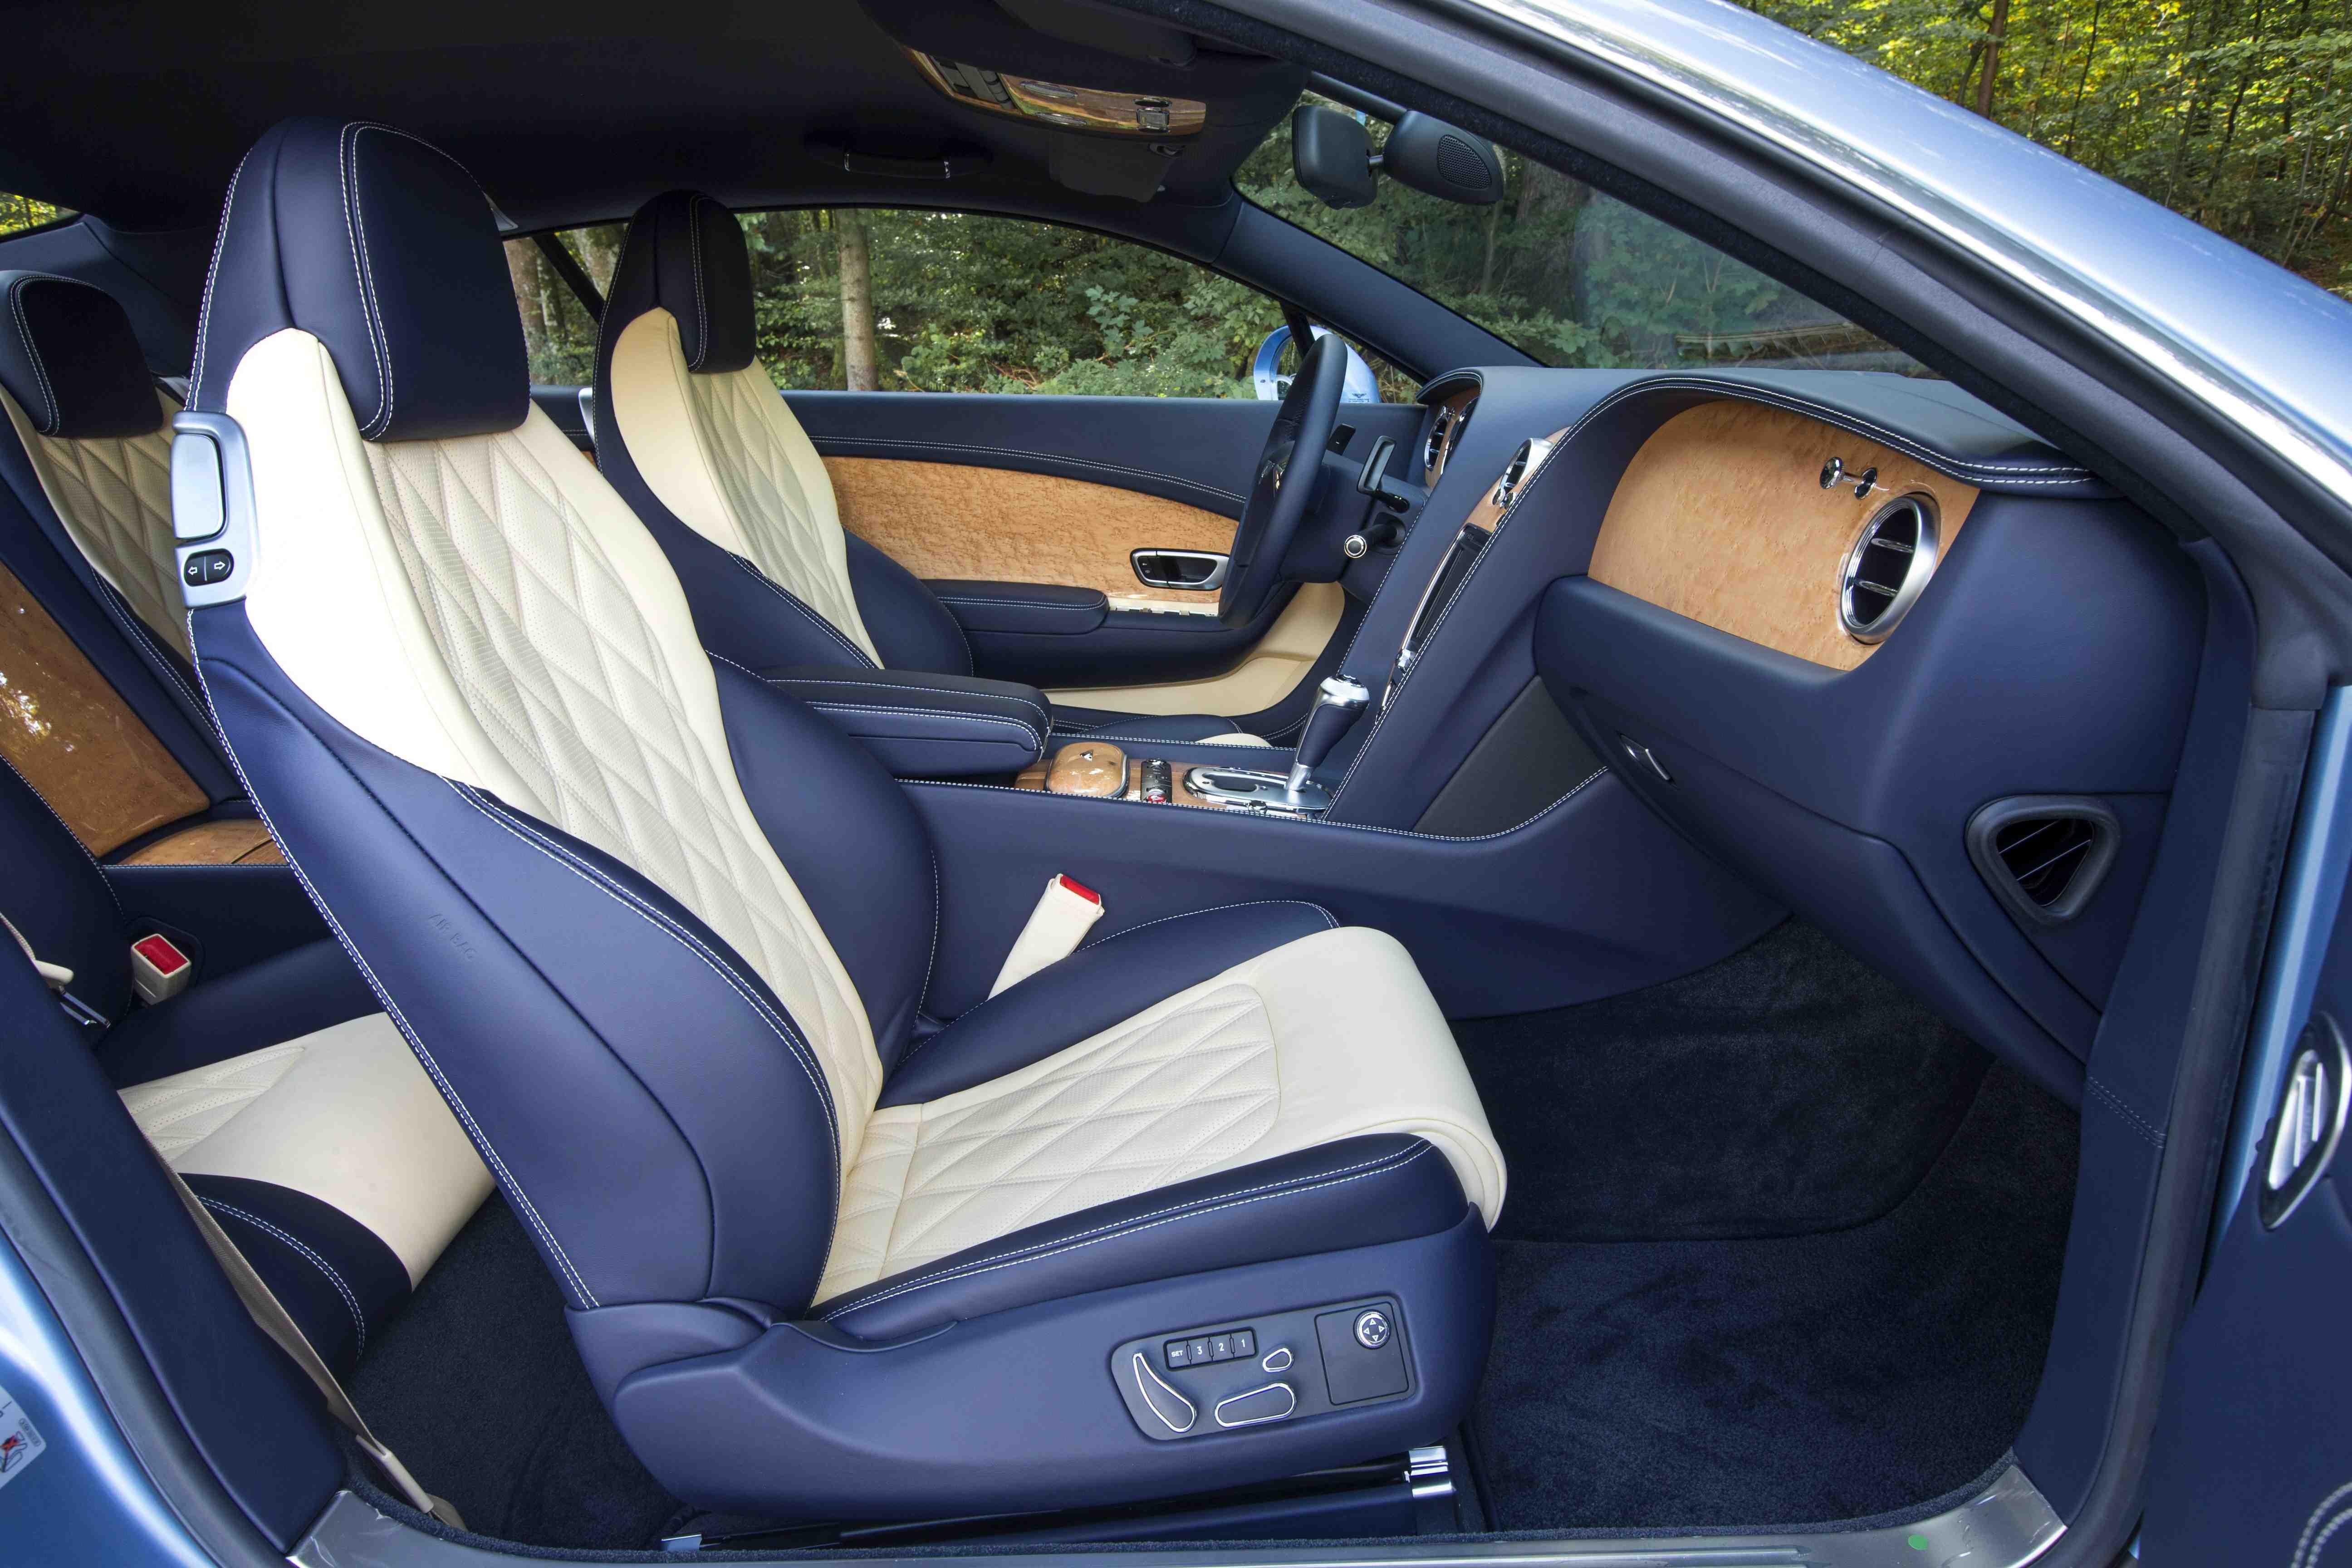 Test Drive Bentley Continental Gt Speed F1socialdiary